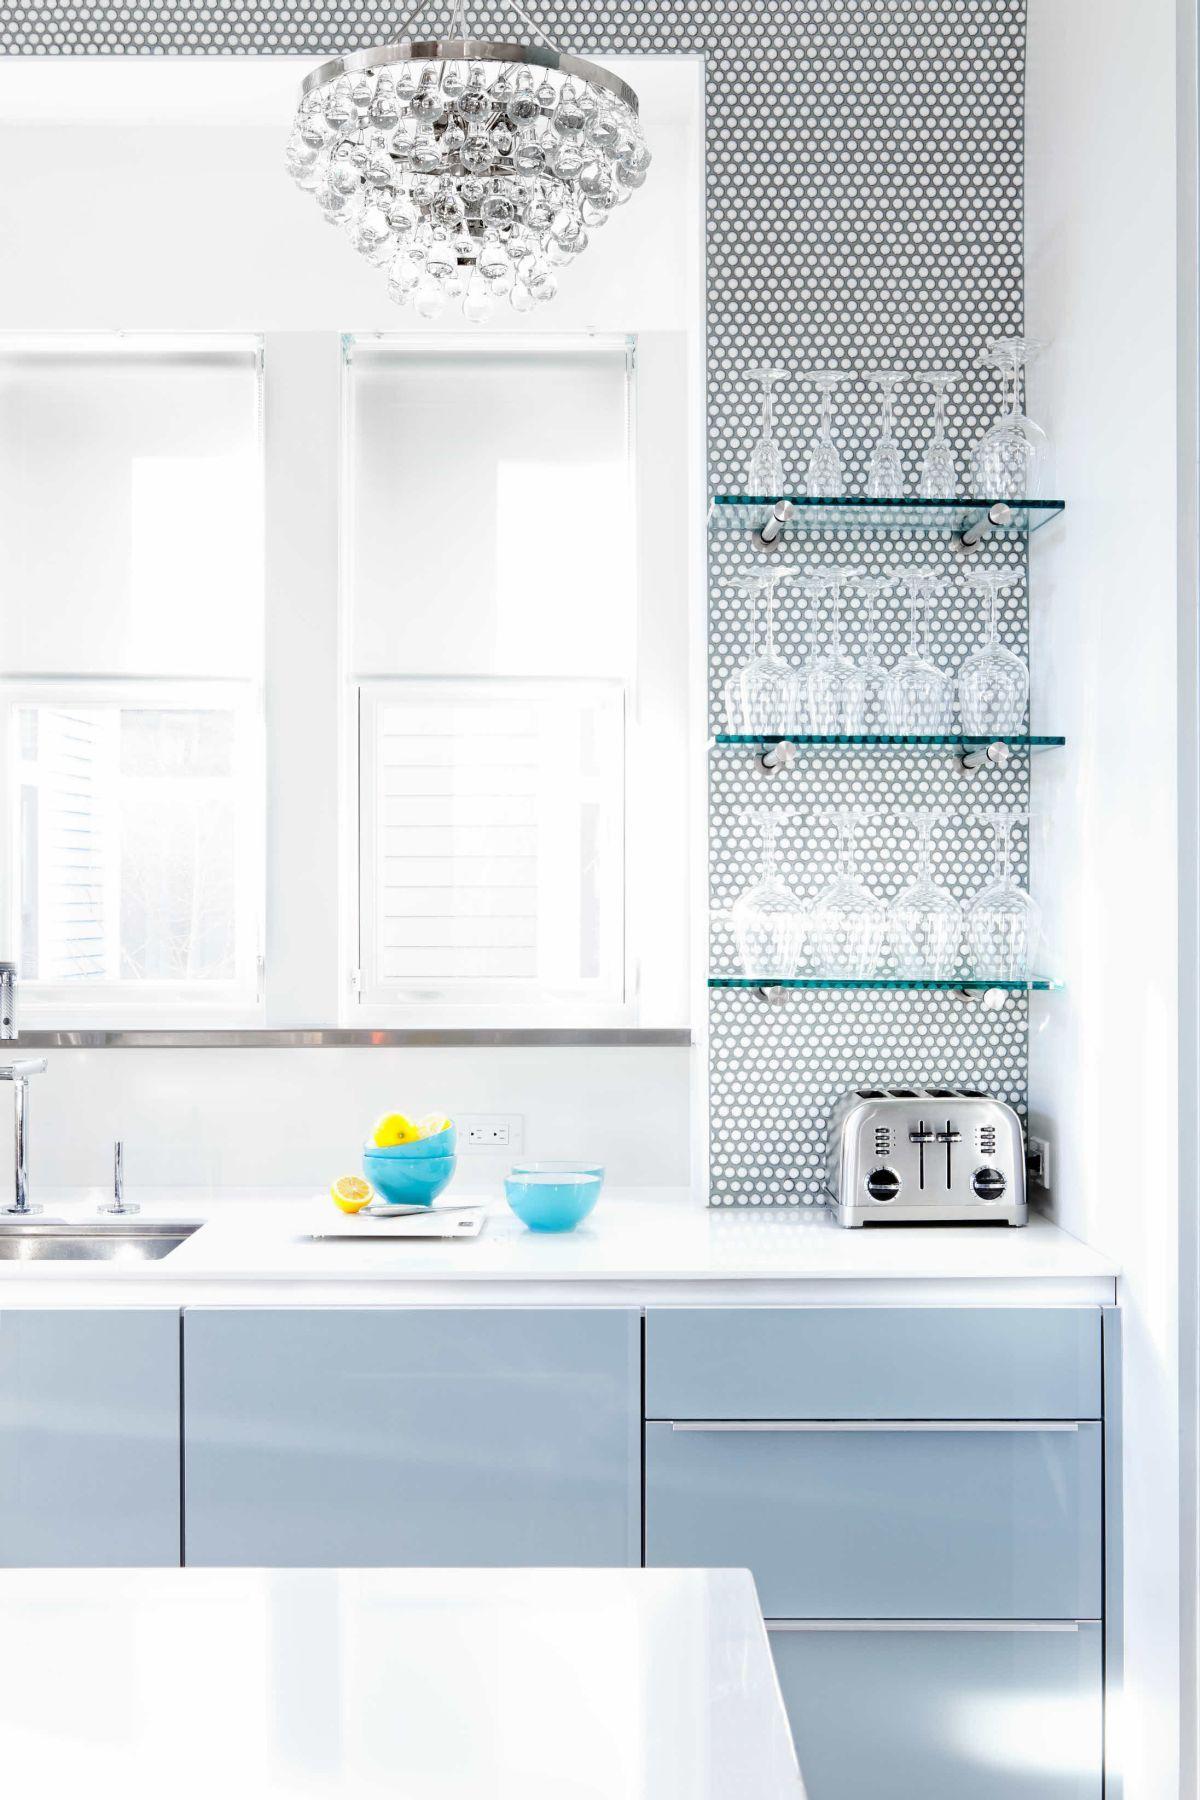 Penny Tile Kitchen - Kitchen Design Ideas on